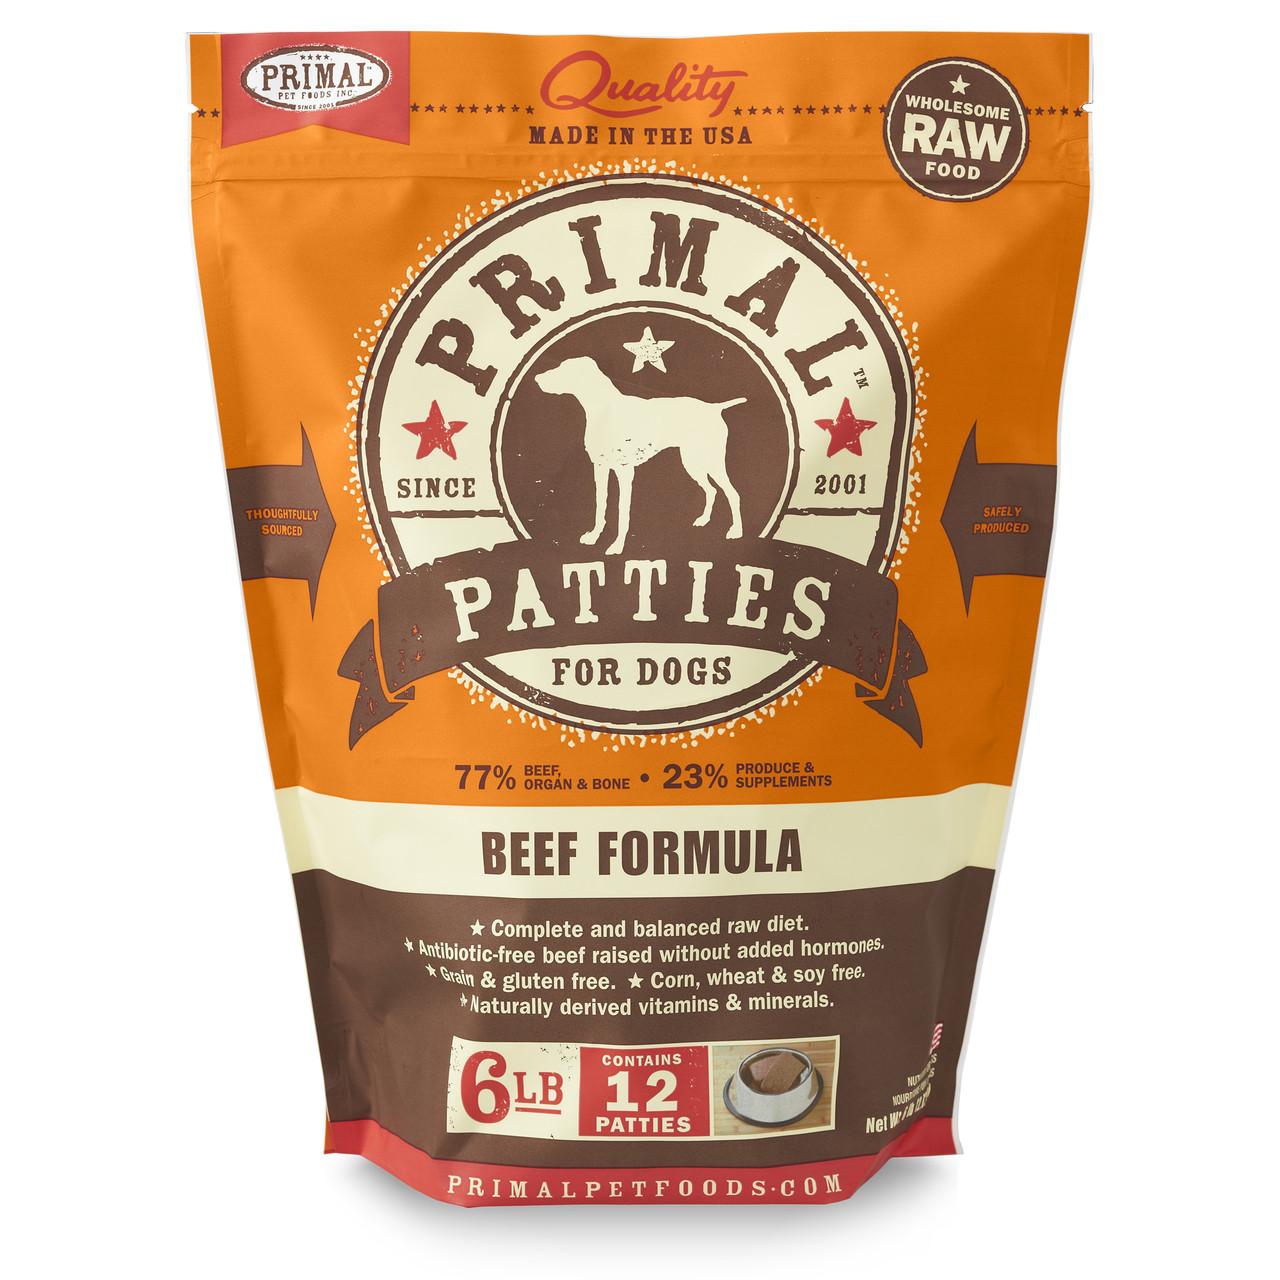 Primal Raw Frozen Canine Patties Beef Formula Dog Food